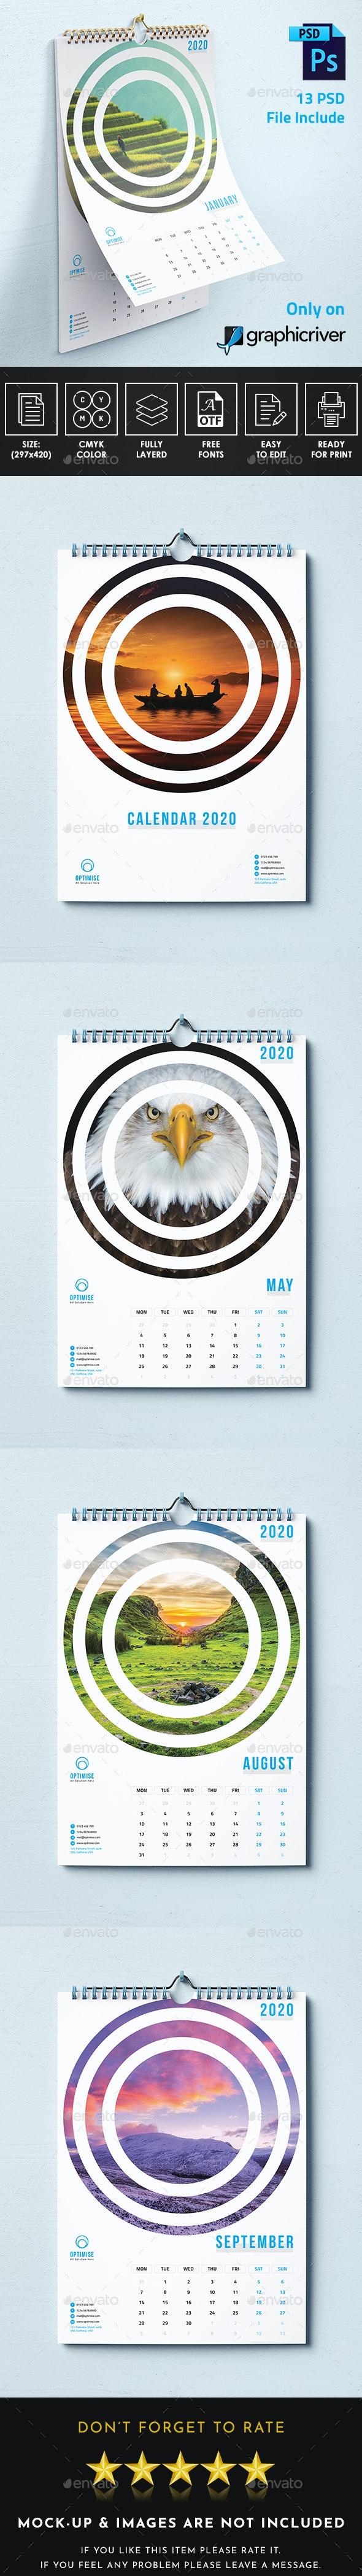 Creative Wall Calendar 2020 - Calendars Stationery